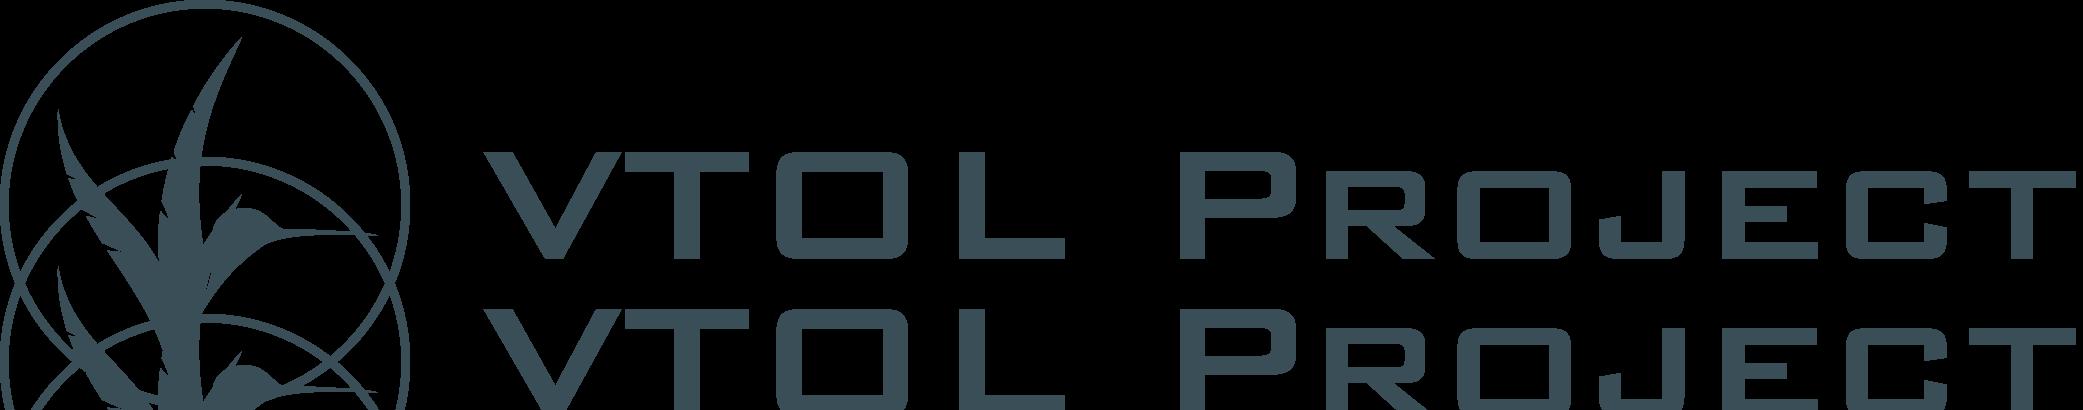 VTOL Project